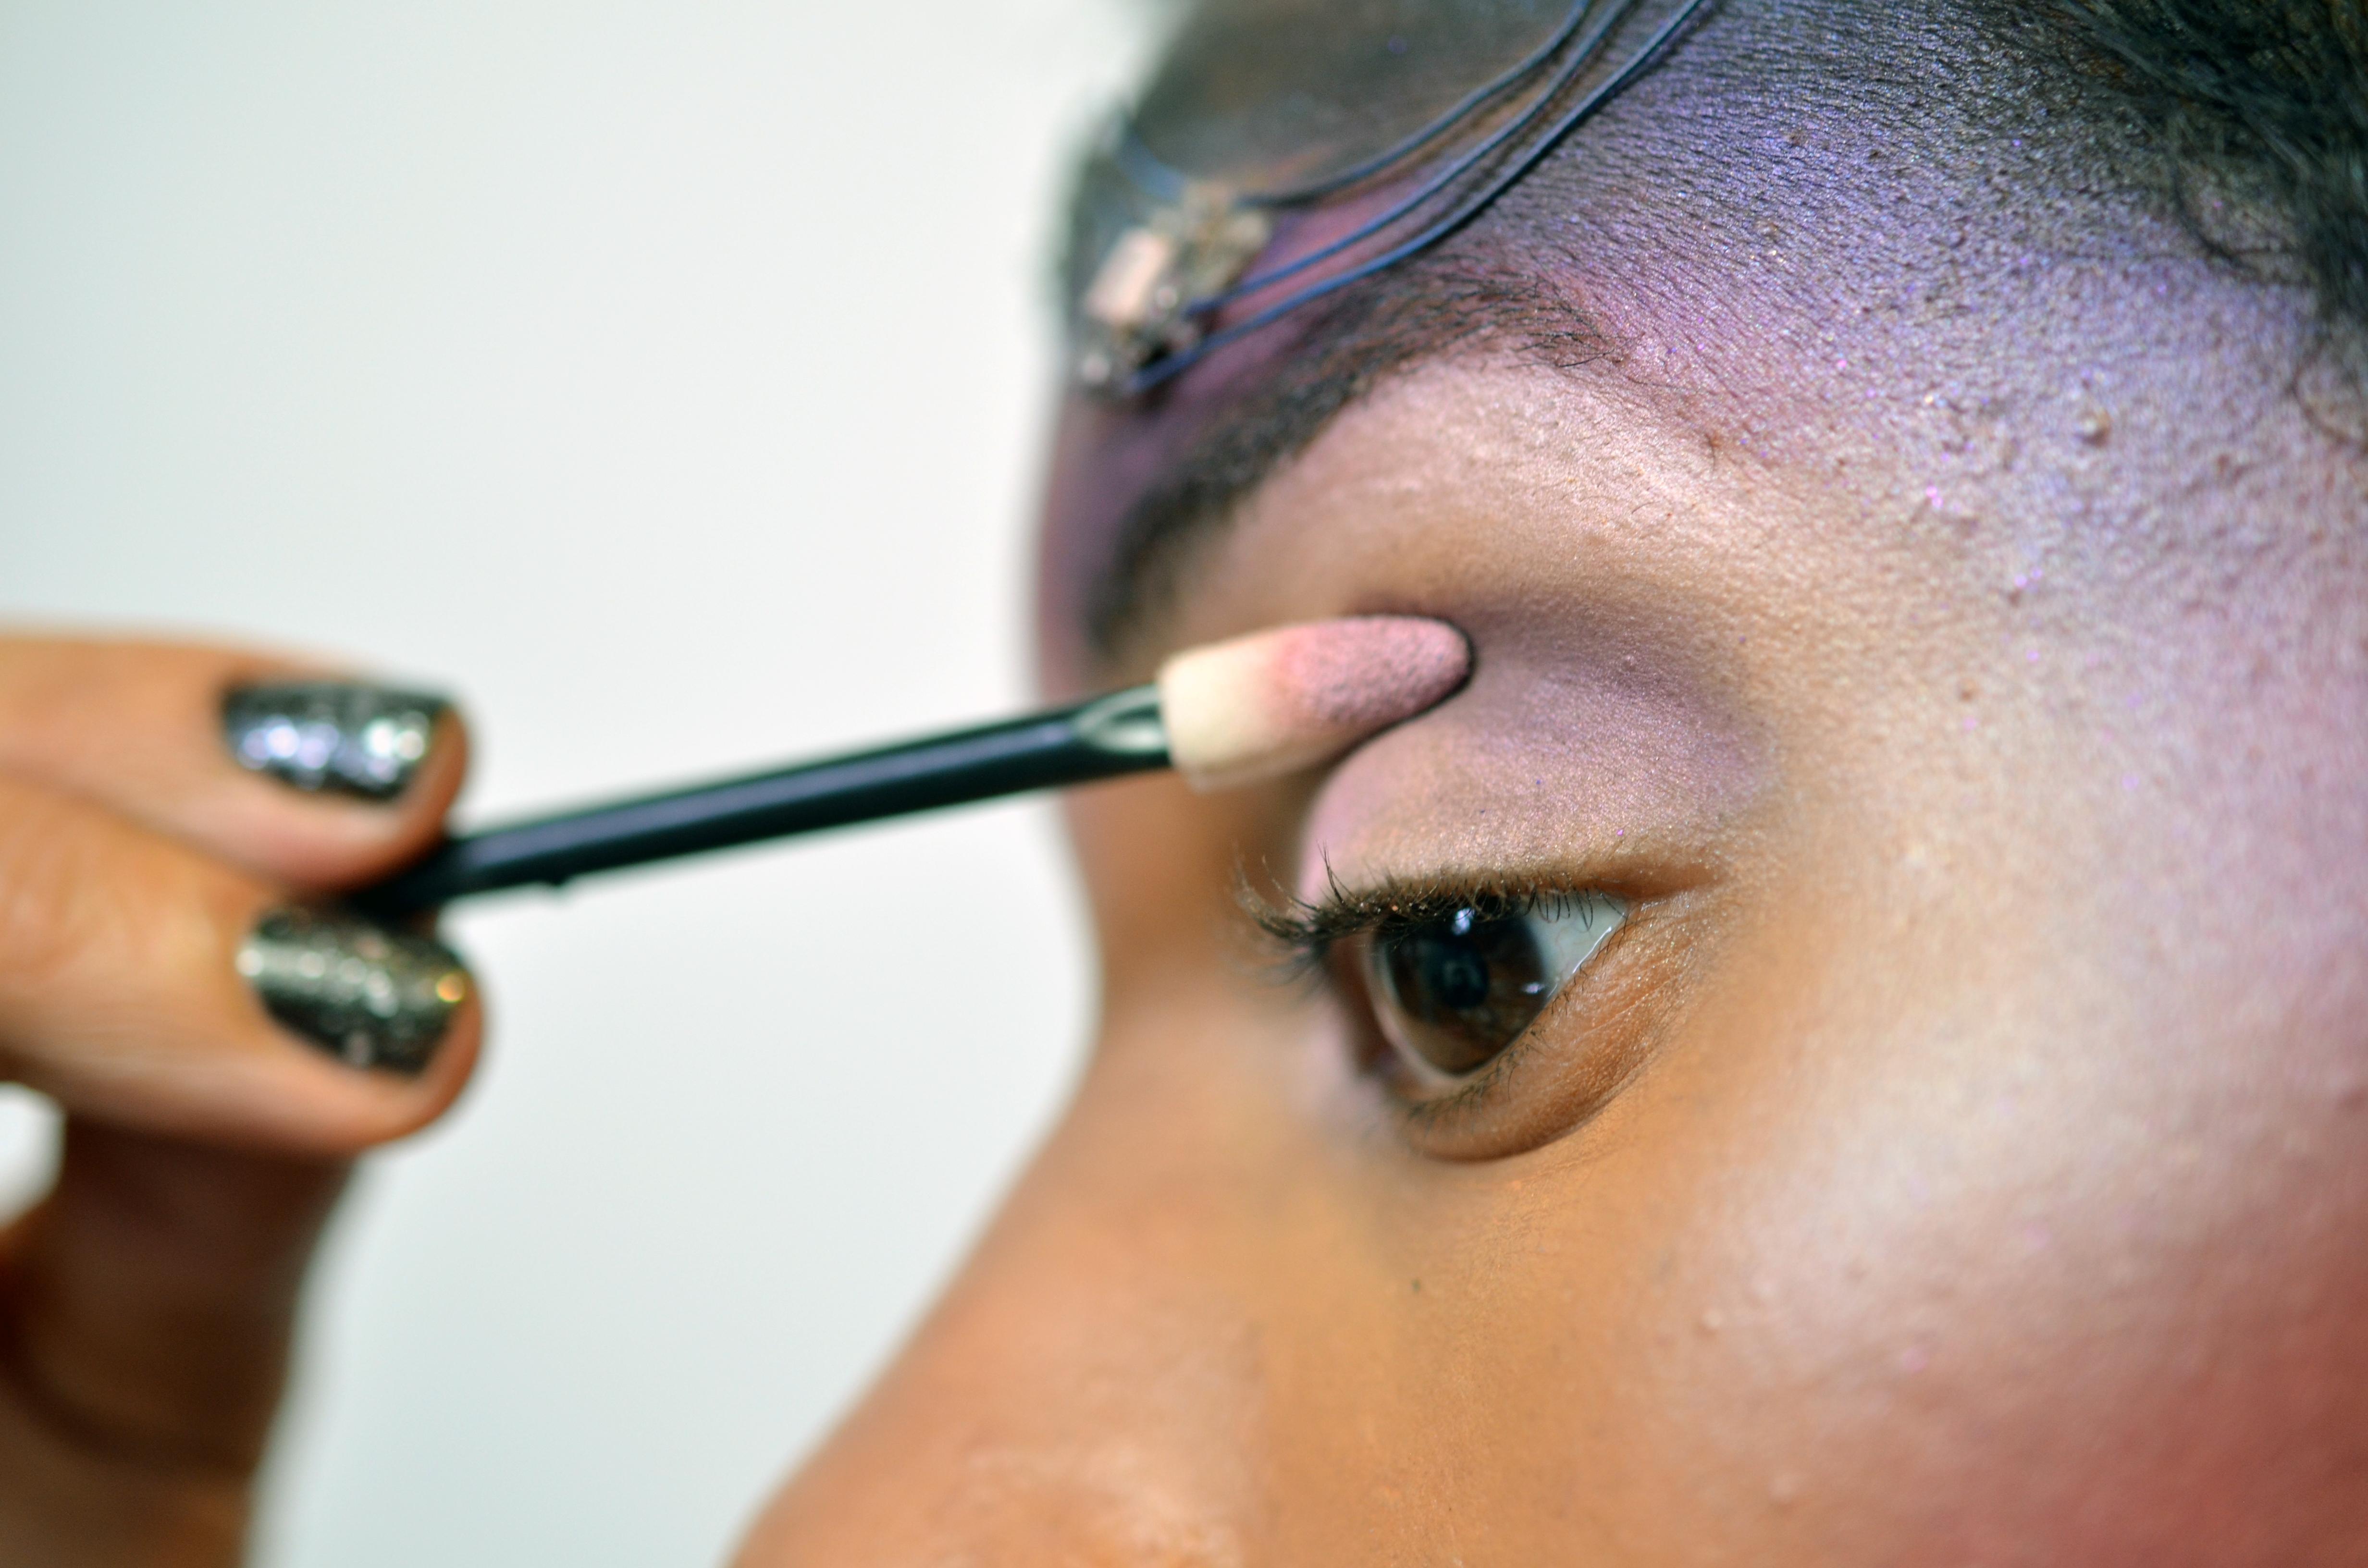 flora_space-face-LED-galaxy-makeup-19.jpg